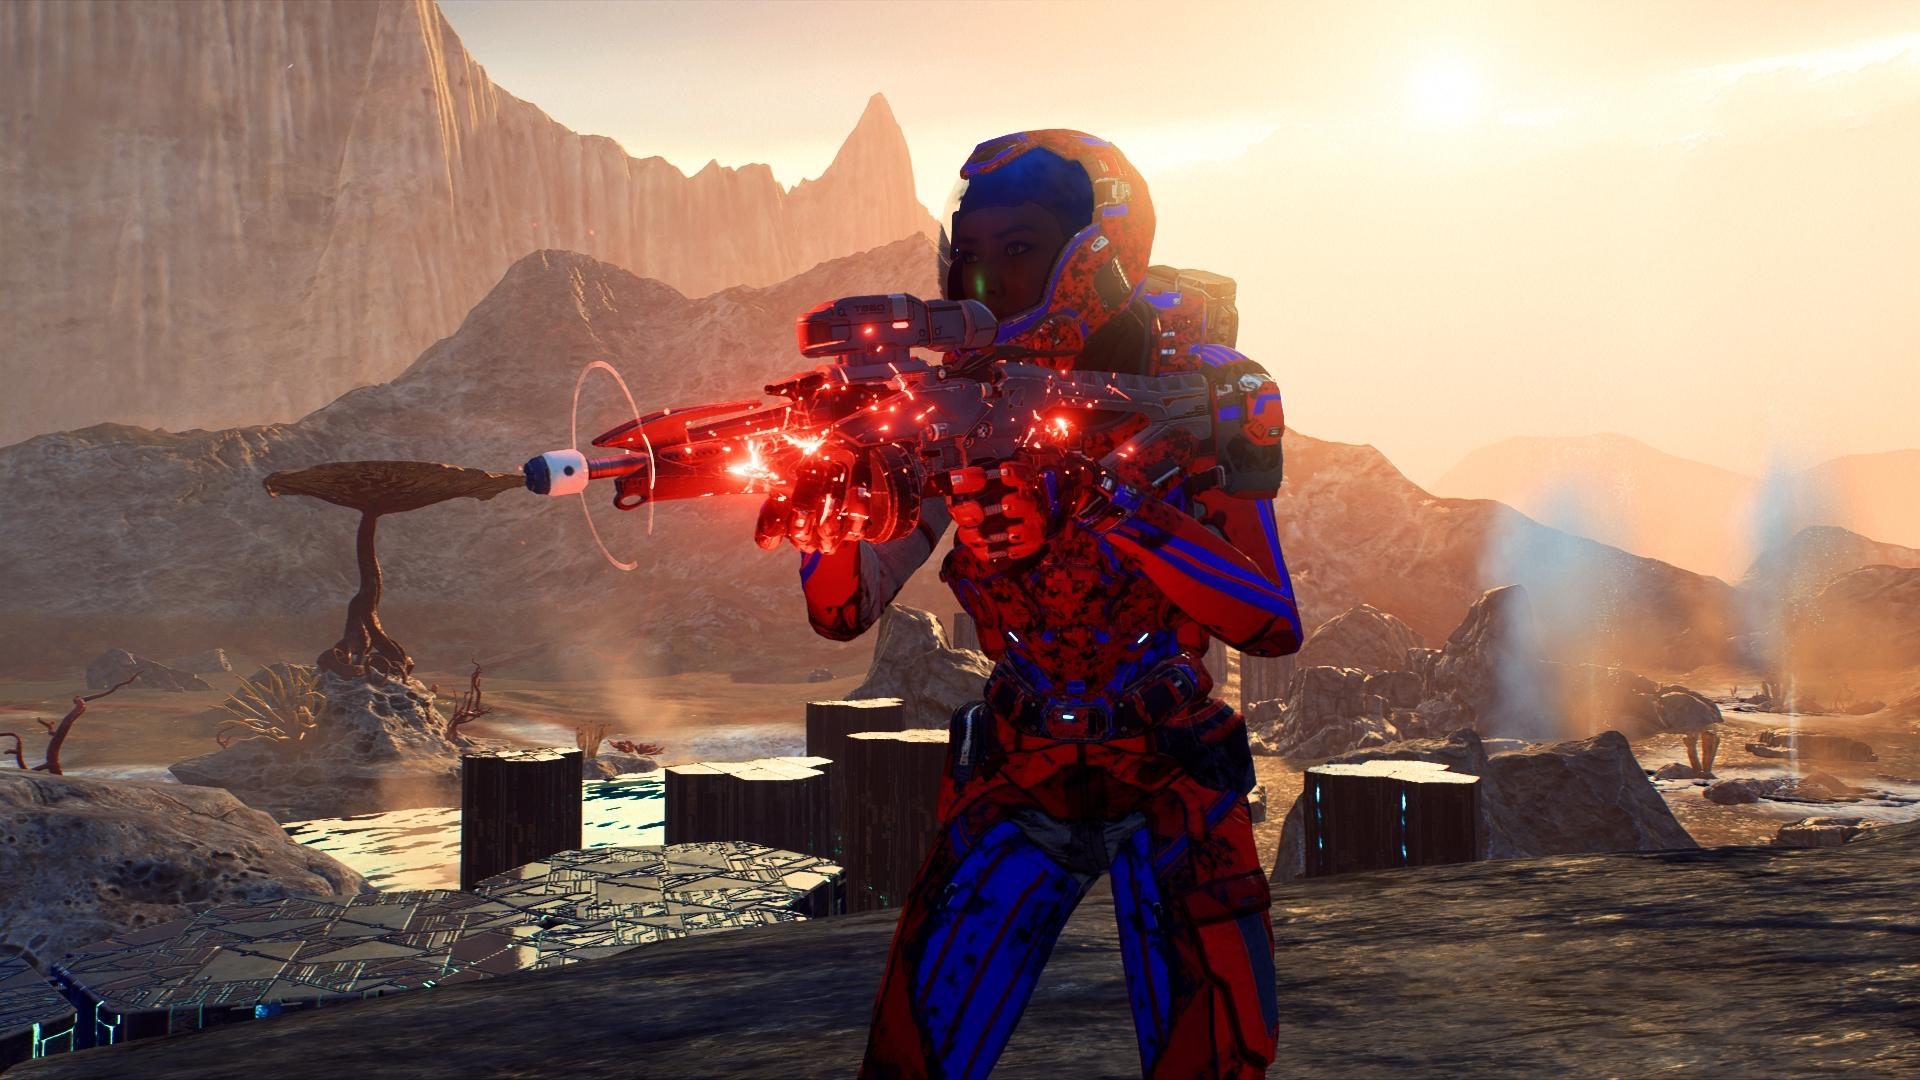 000763.Jpg - Mass Effect: Andromeda